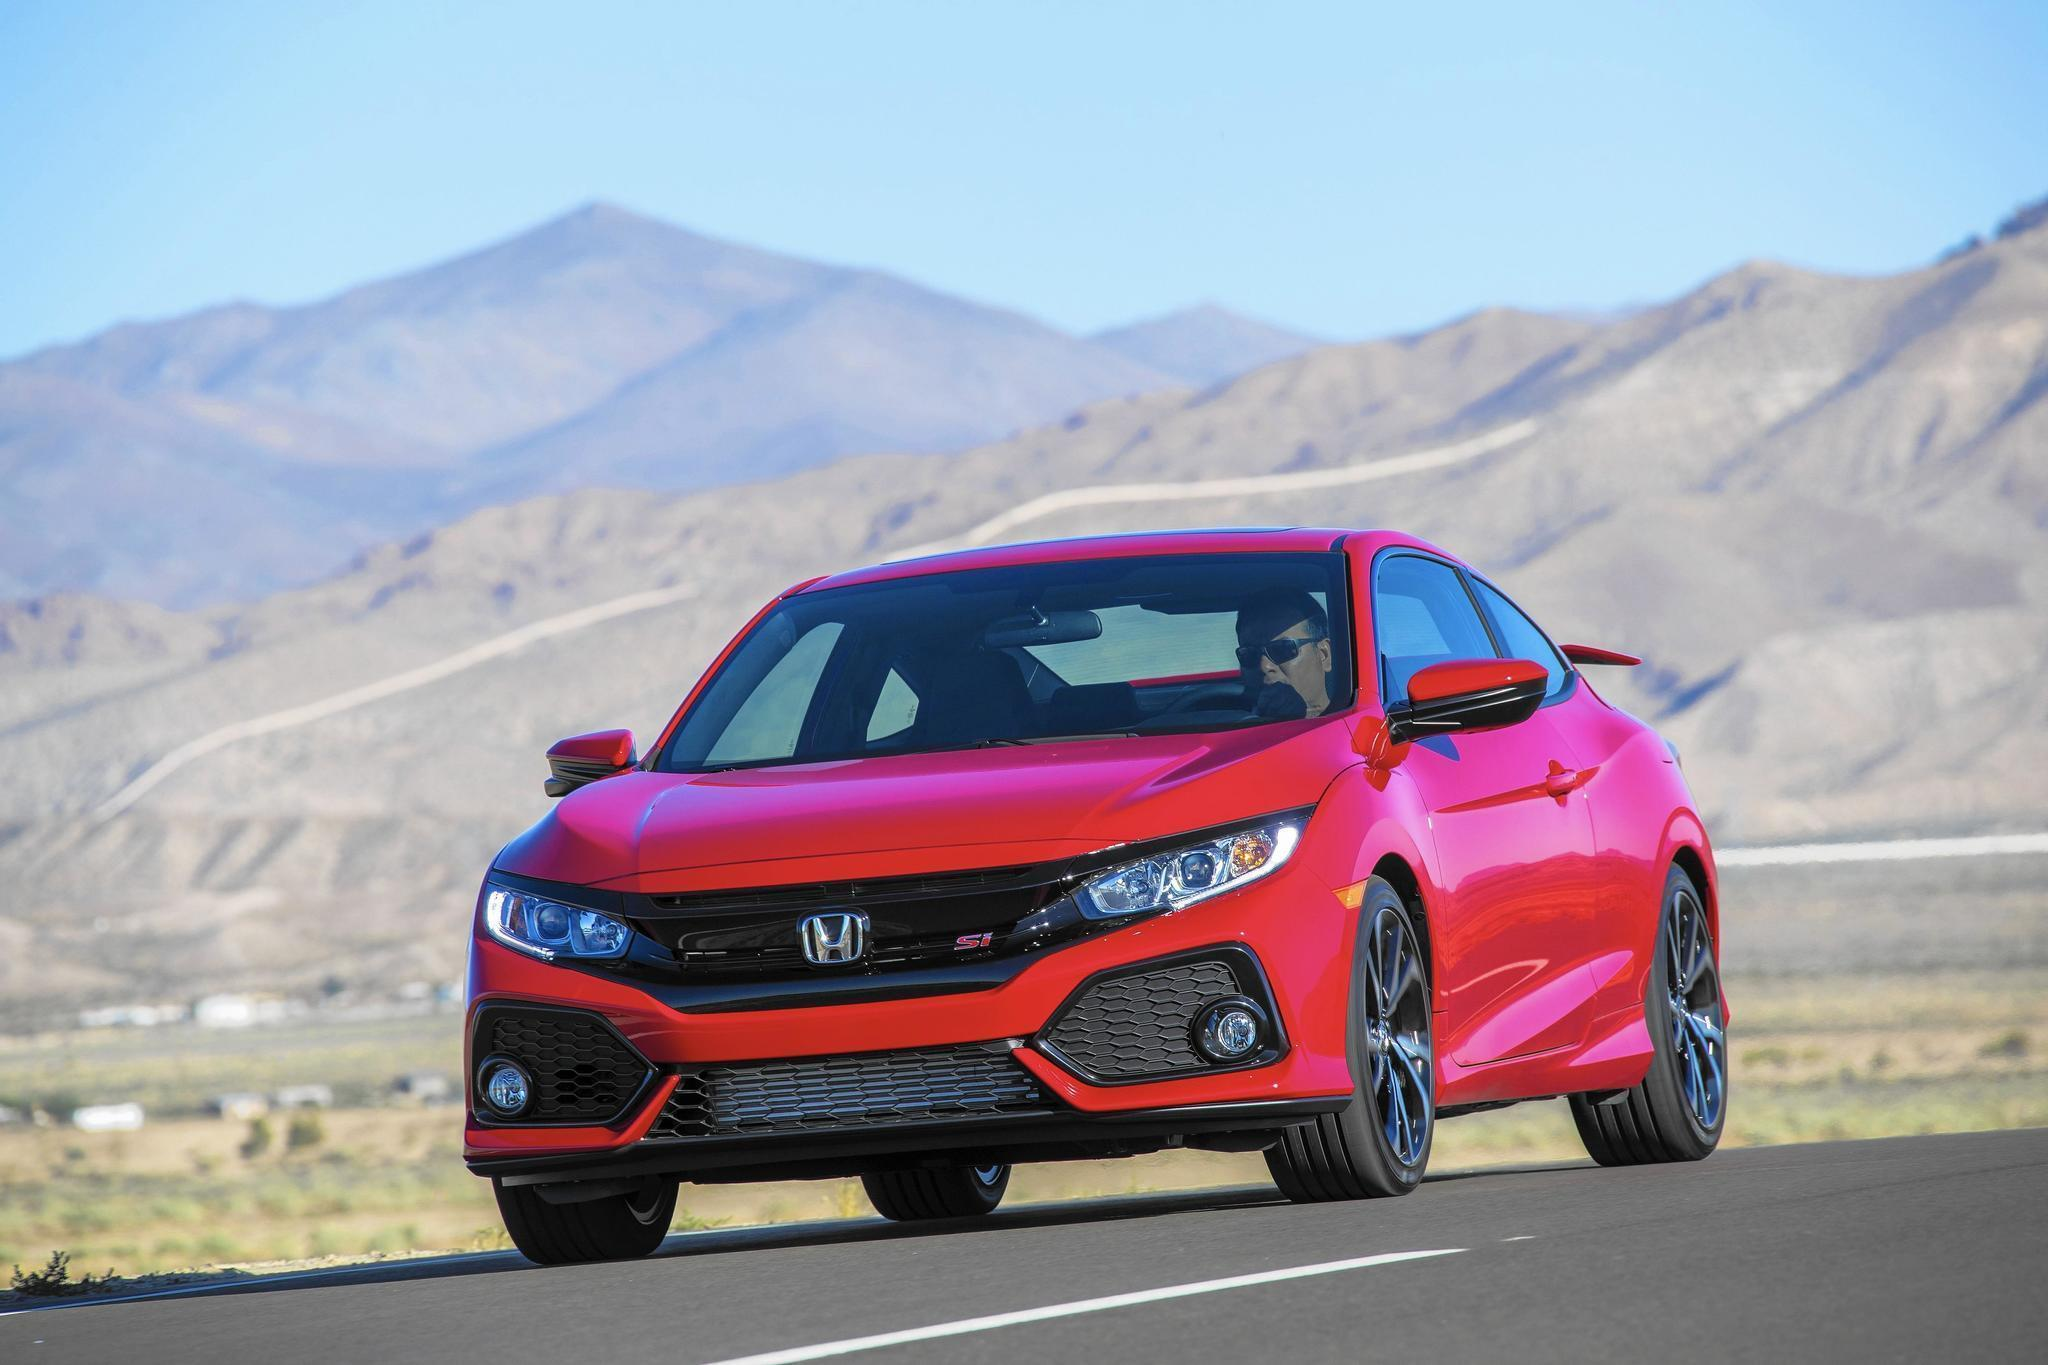 civic honda si coupe sedan cars affordable selling road sports priced return success drive leadership compact winning continue award dealerships